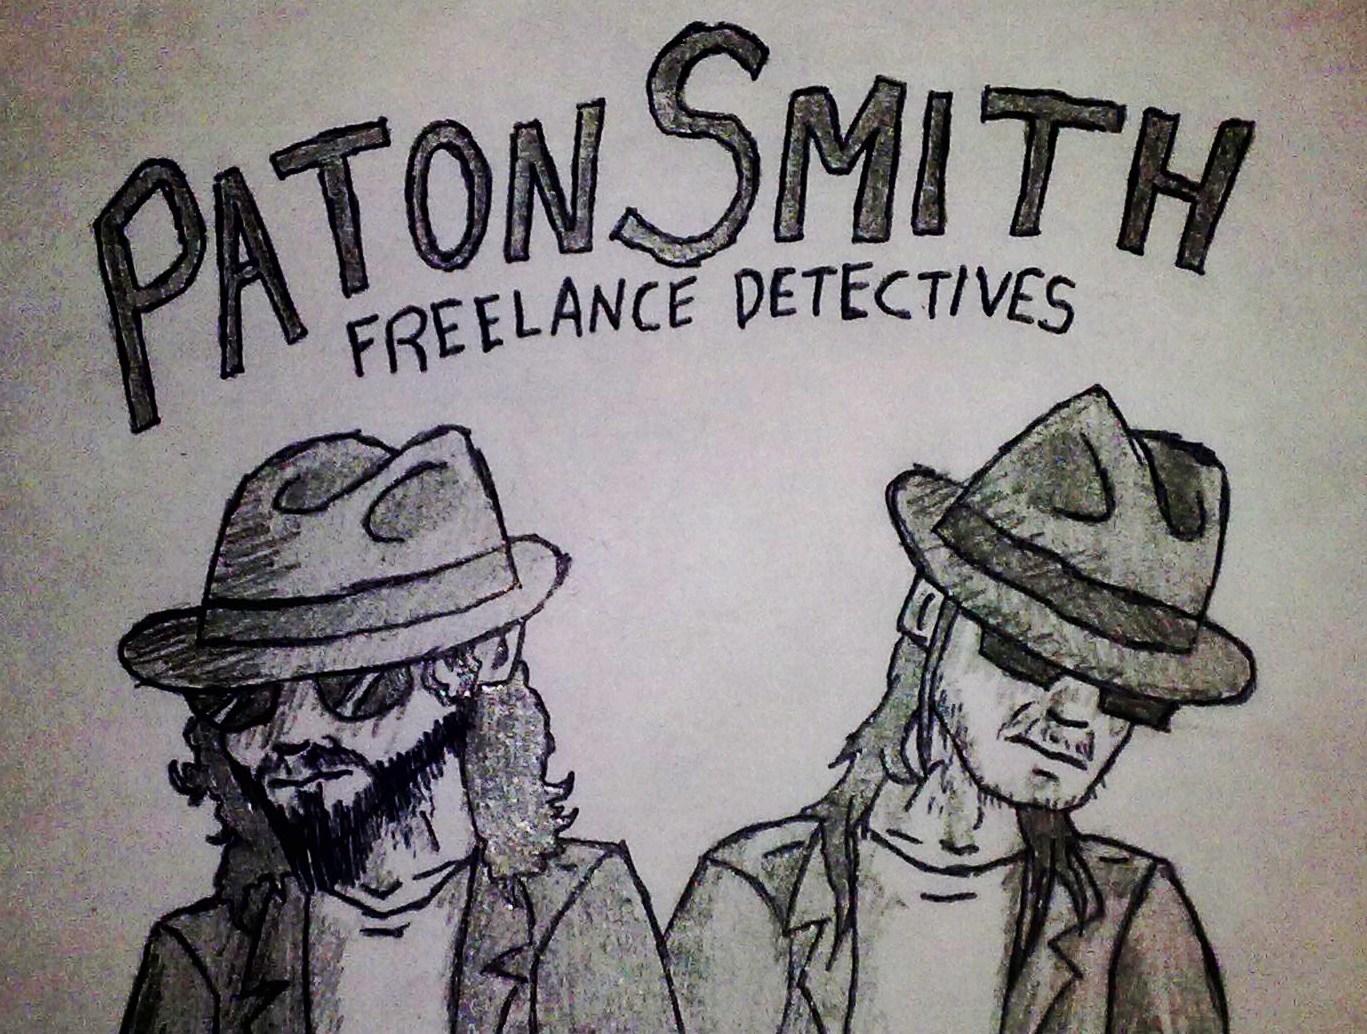 PatonSmith